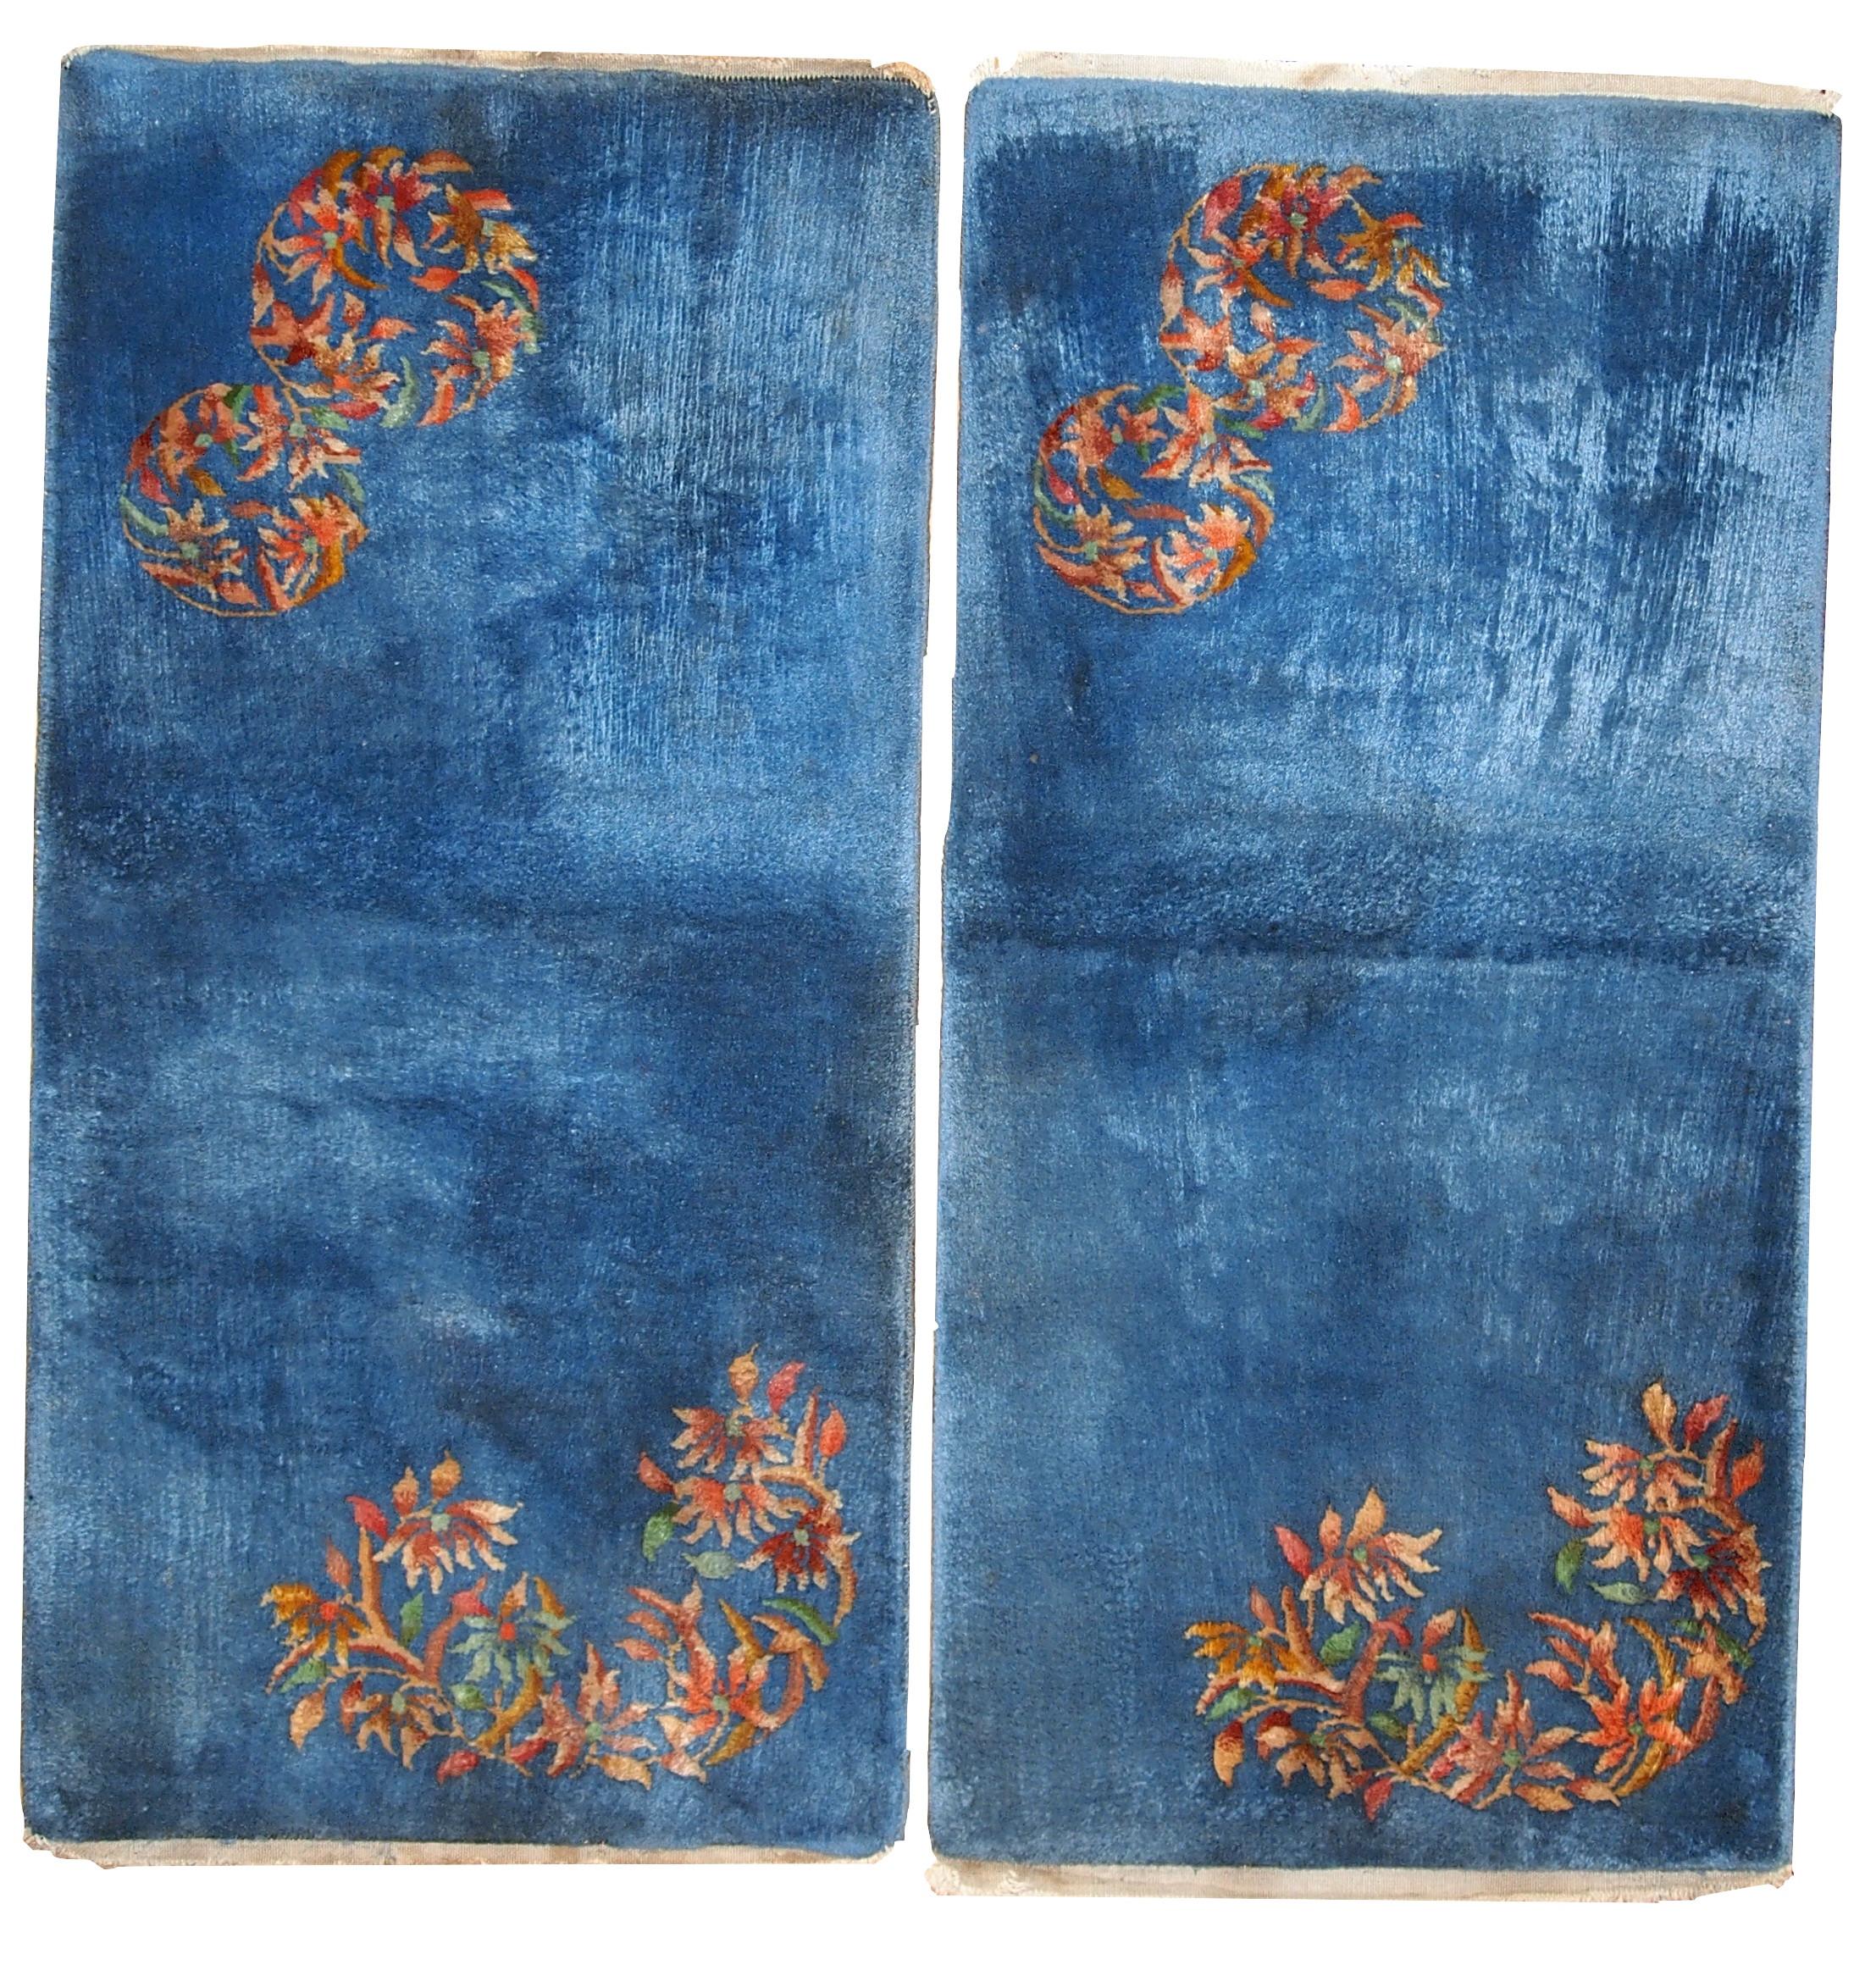 Handmade Vintage Art Deco Chinese Rugs